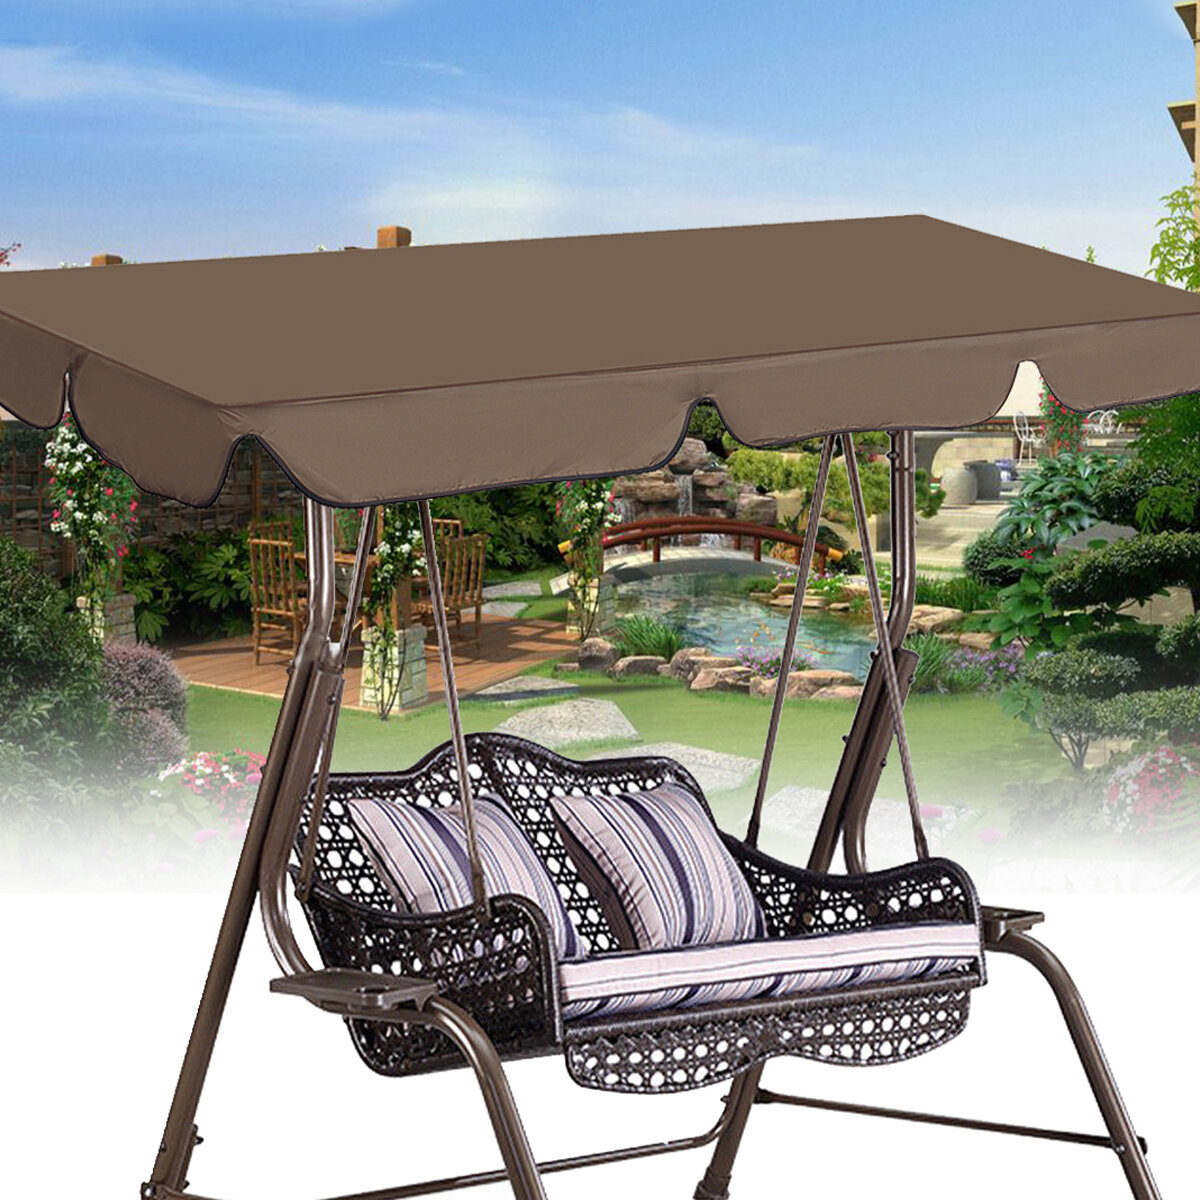 Cubierta superior de silla giratoria de 190x132 cm Cubierta Impermeable al aire libre cámping Cubierta de repuesto